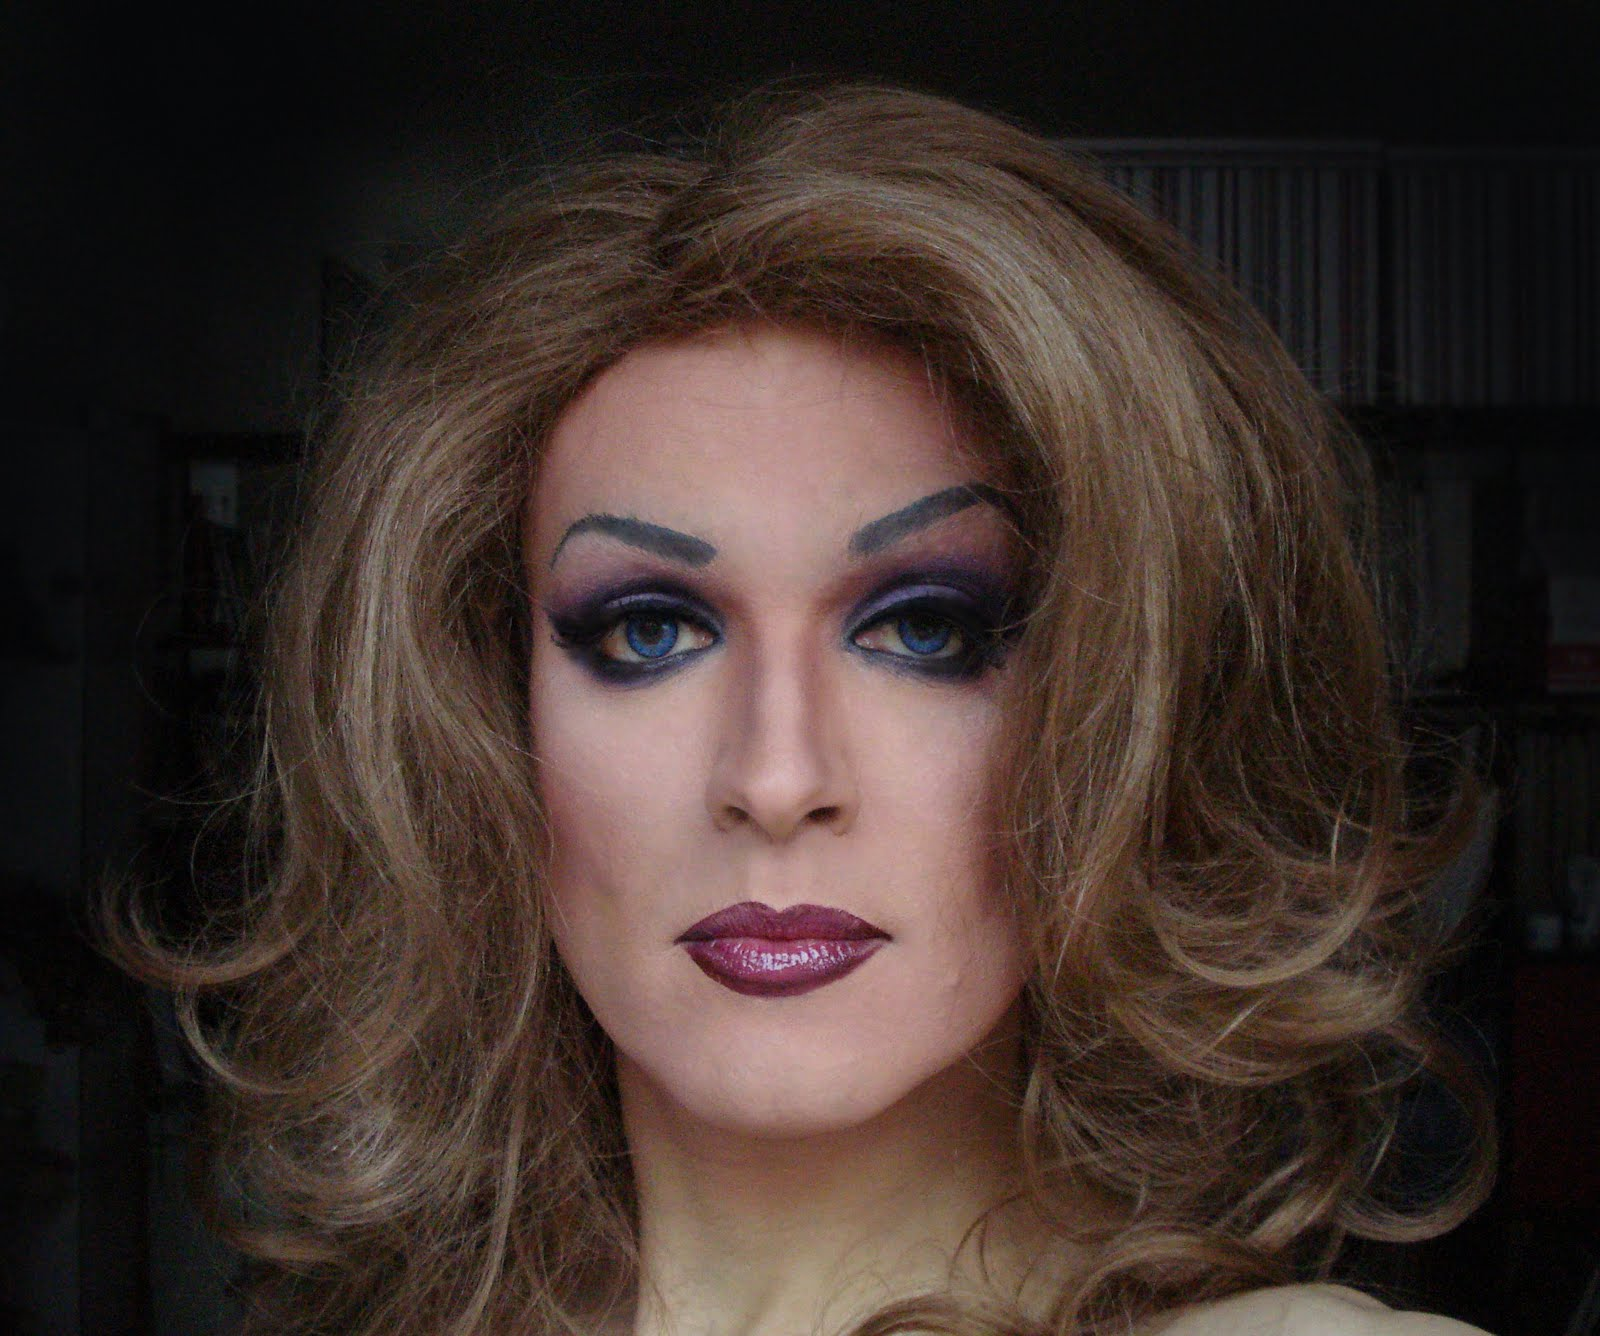 1000 Images About Transvestites On Pinterest